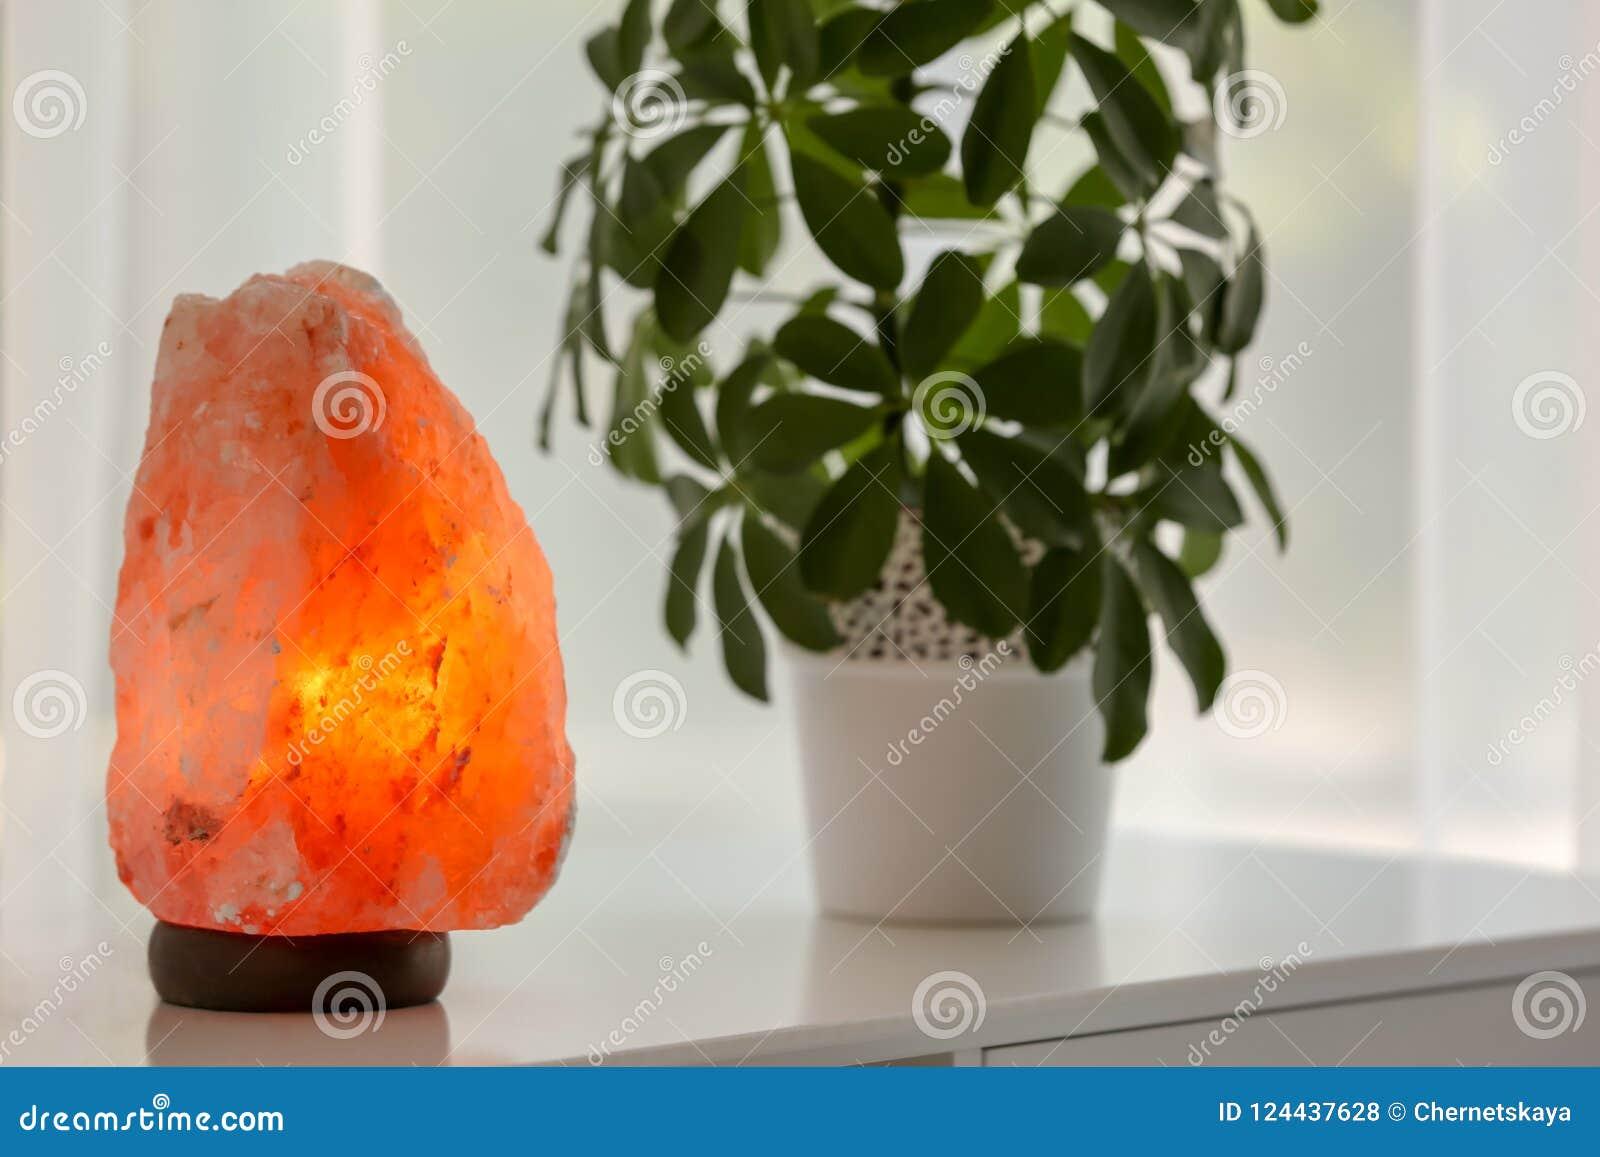 Lámpara Himalayan exótica de la sal